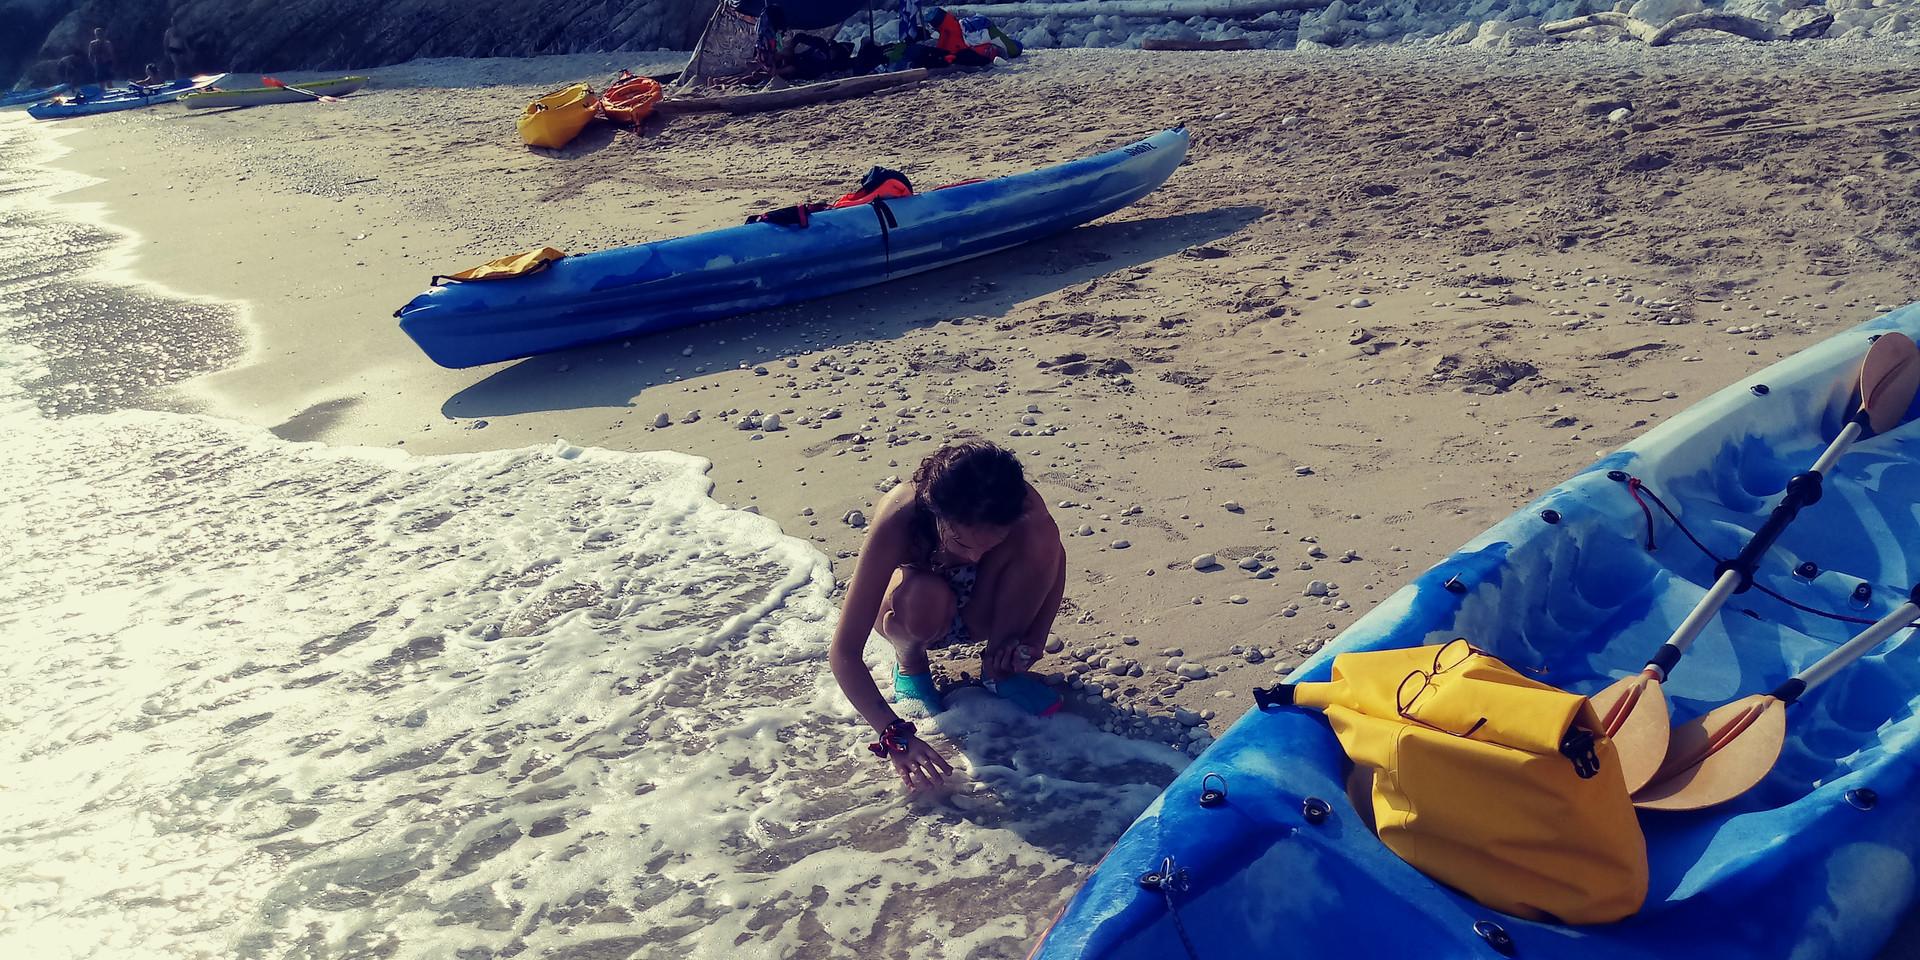 Kayak - spiaggie nascoste a Portonovo